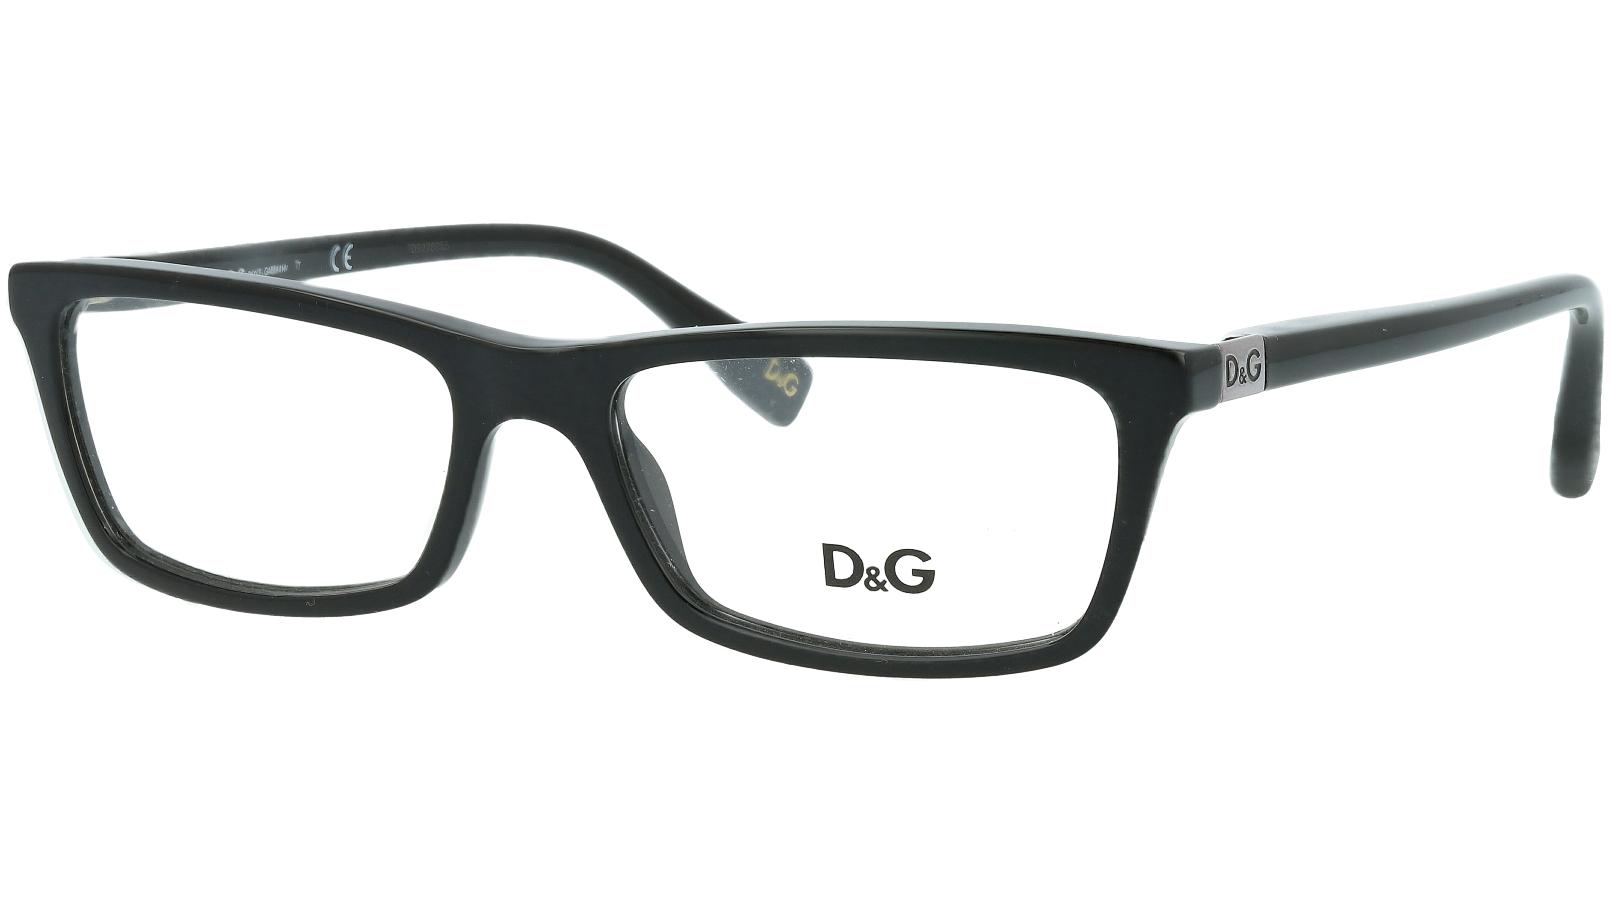 Dolce&Gabbana DG1215 501 52 BLACK Glasses